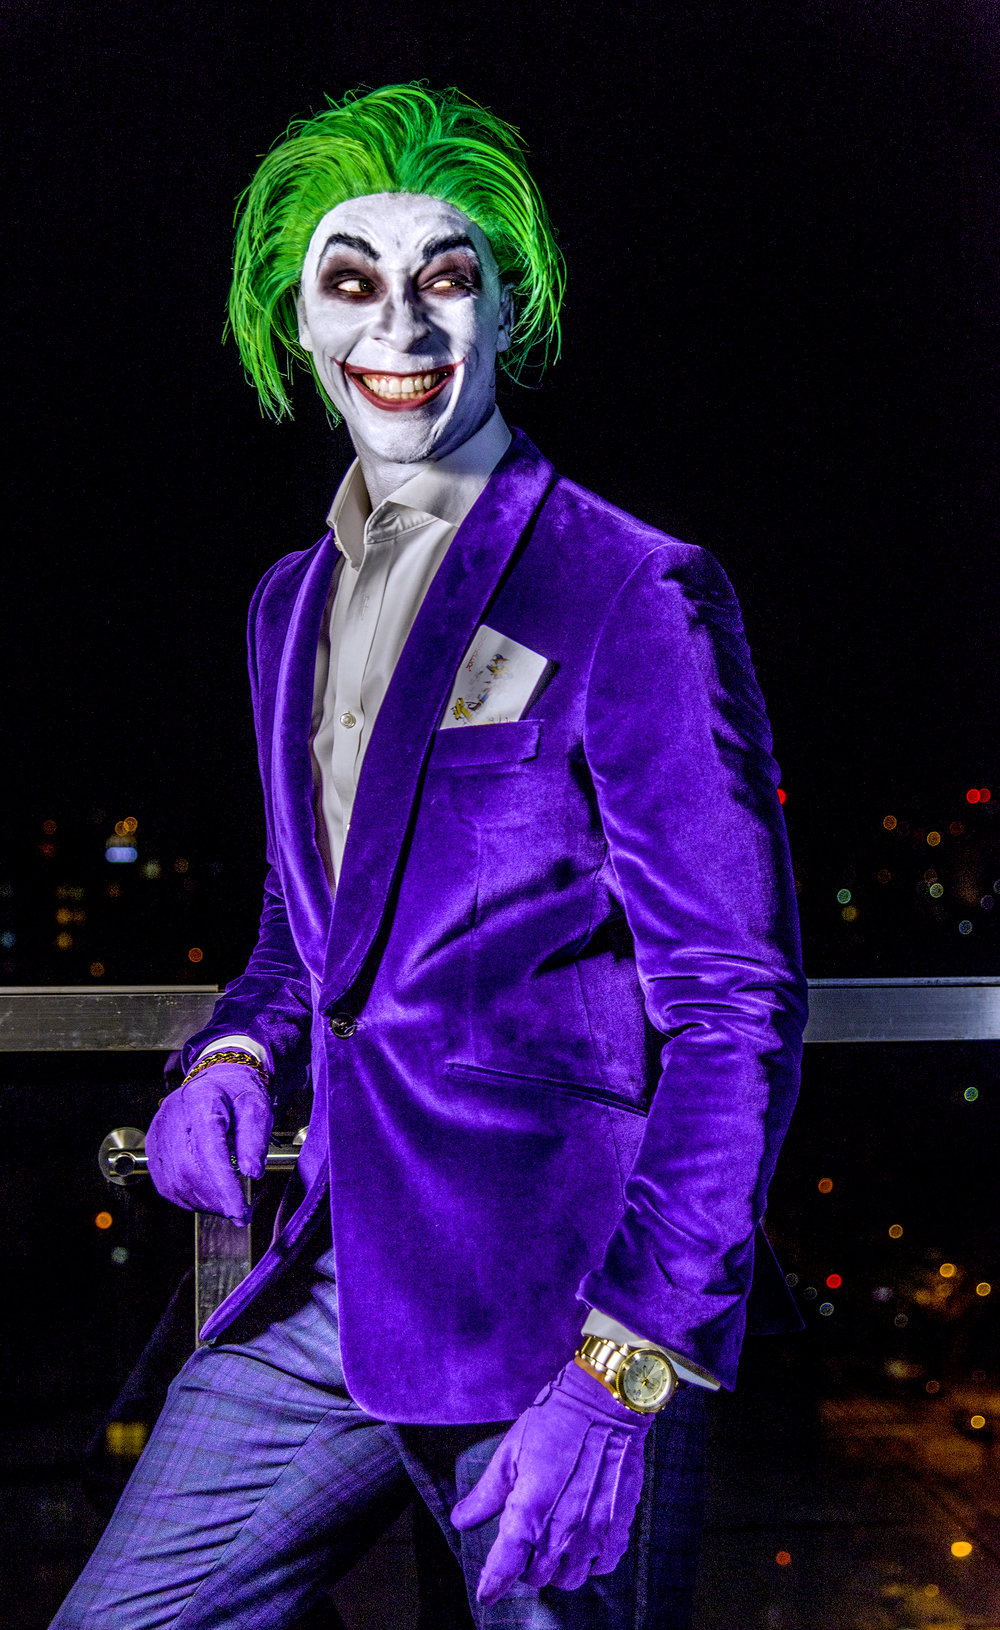 Joker 3tif.jpg